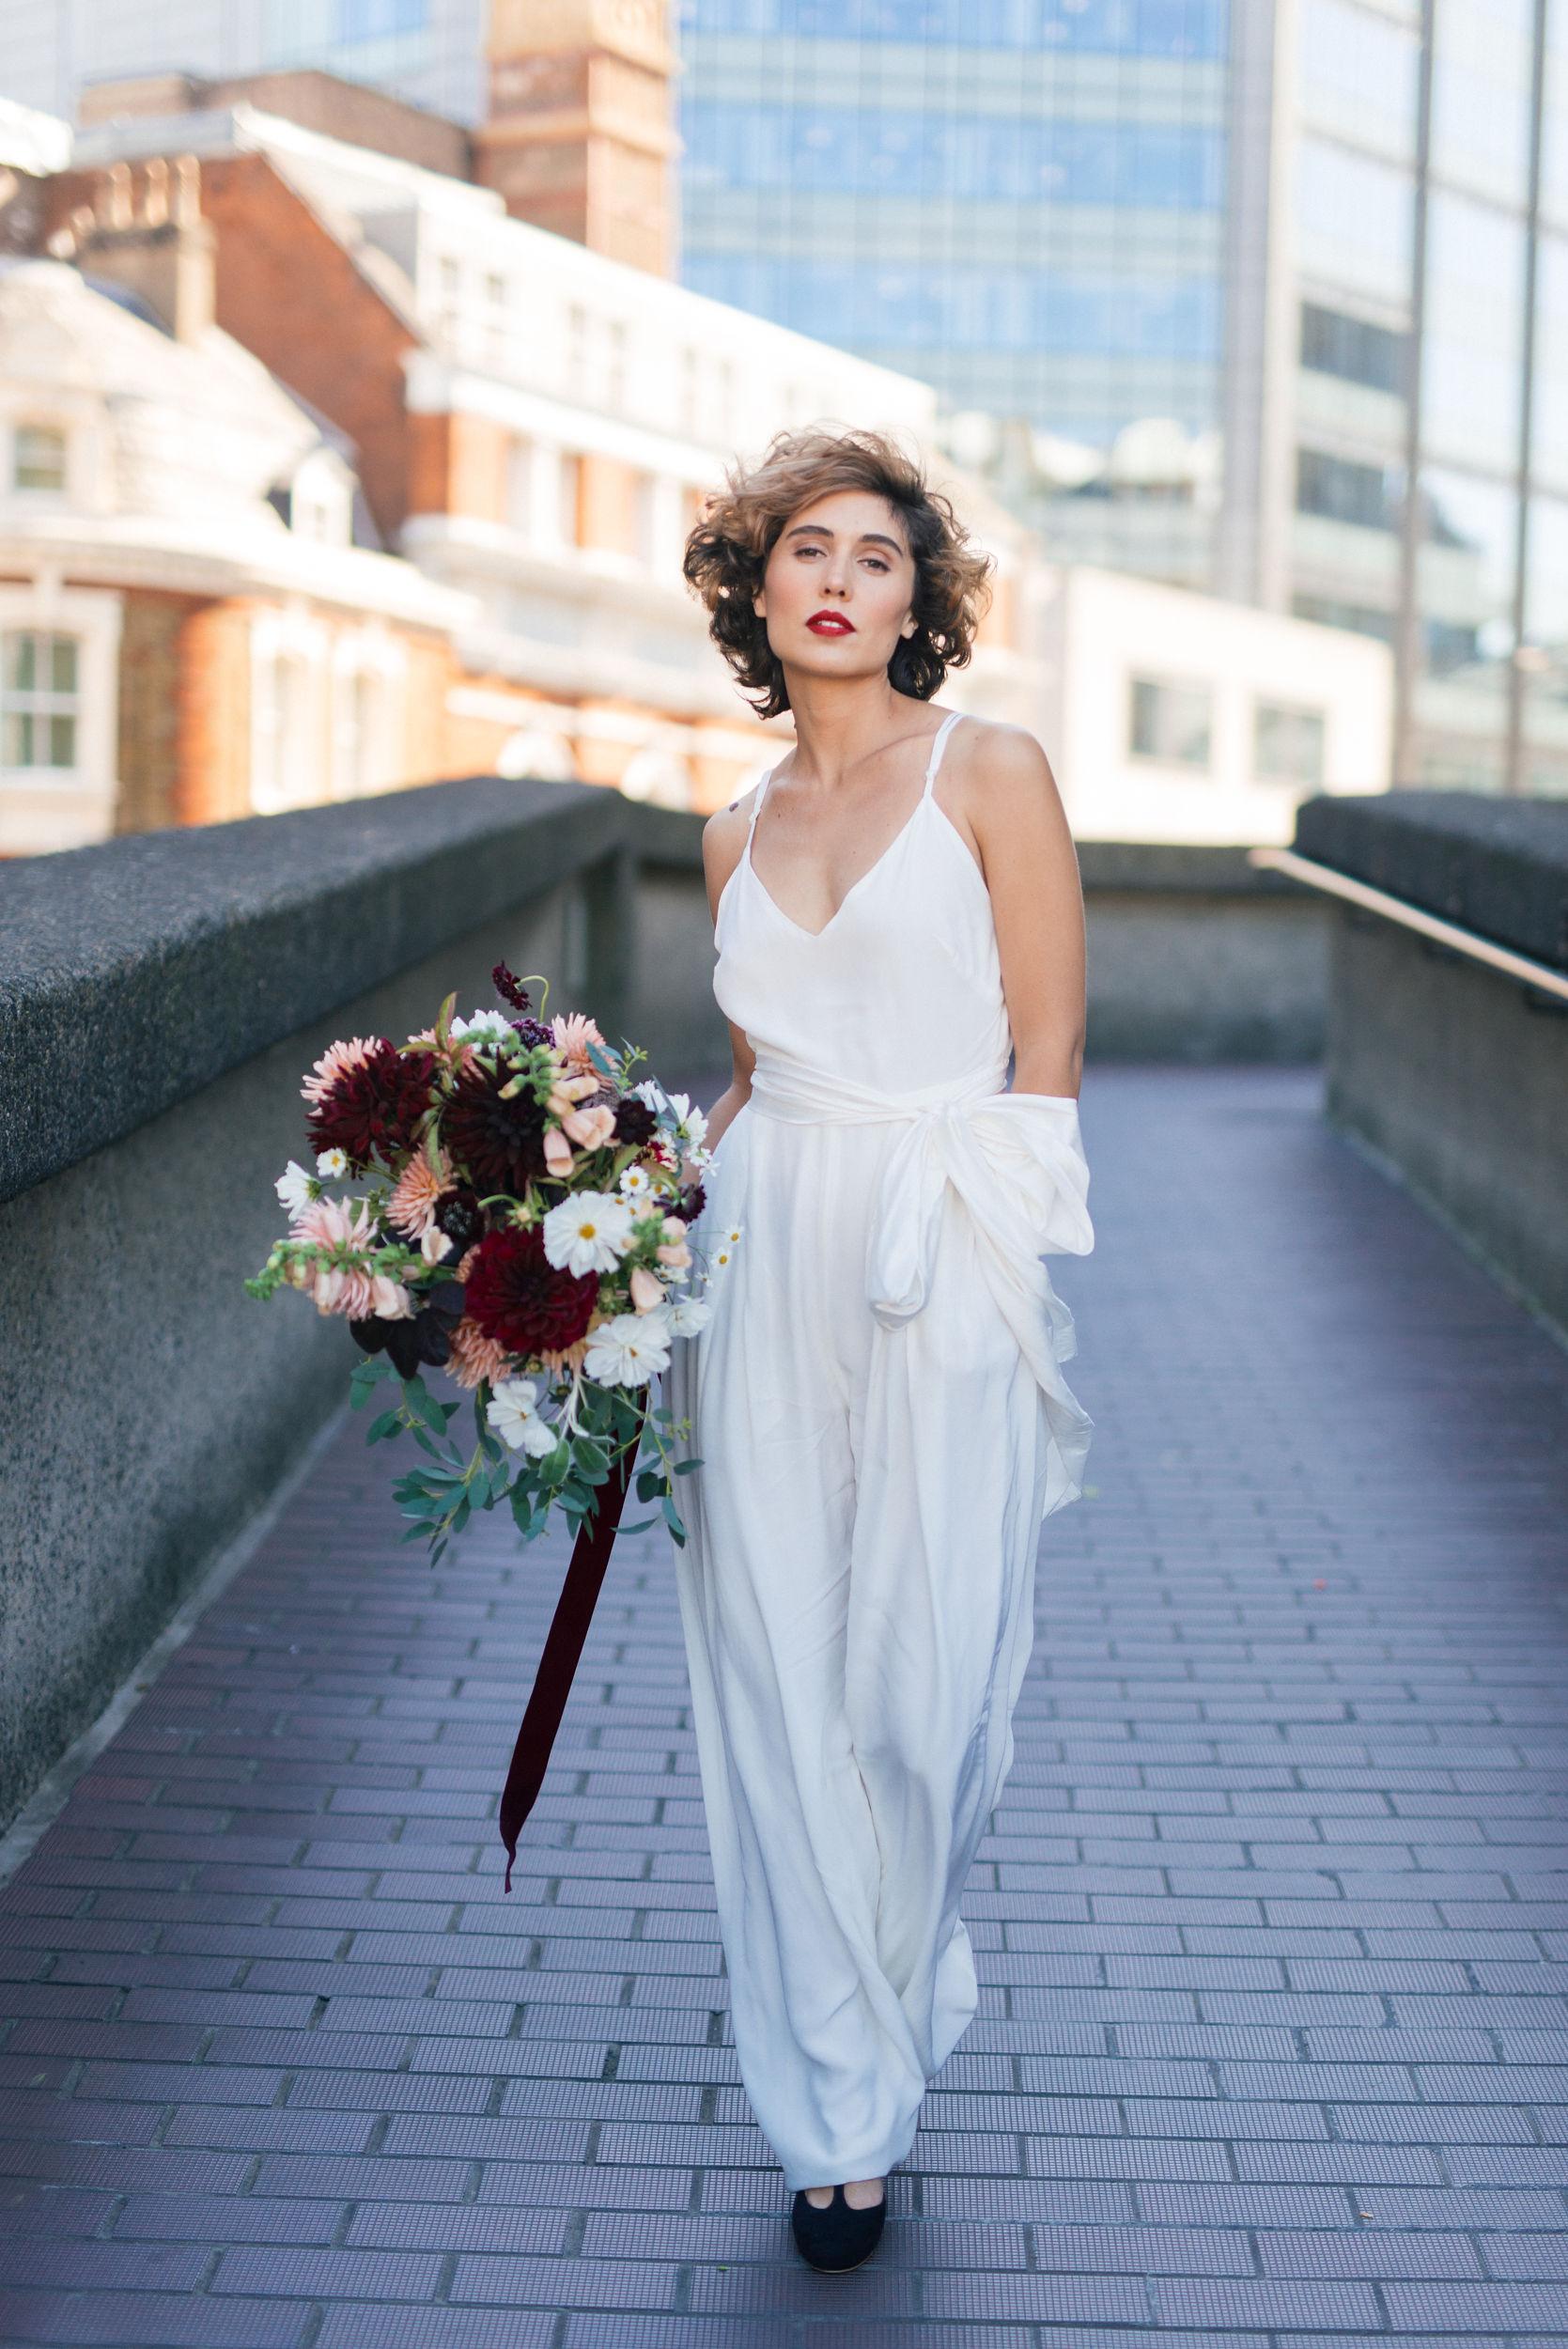 Photographer - Sussie Mellstedt  Model - Clementine Bourdin  Jumpsuit - Heart Aflutter Bridal  Flowers - Dove And Myrtle